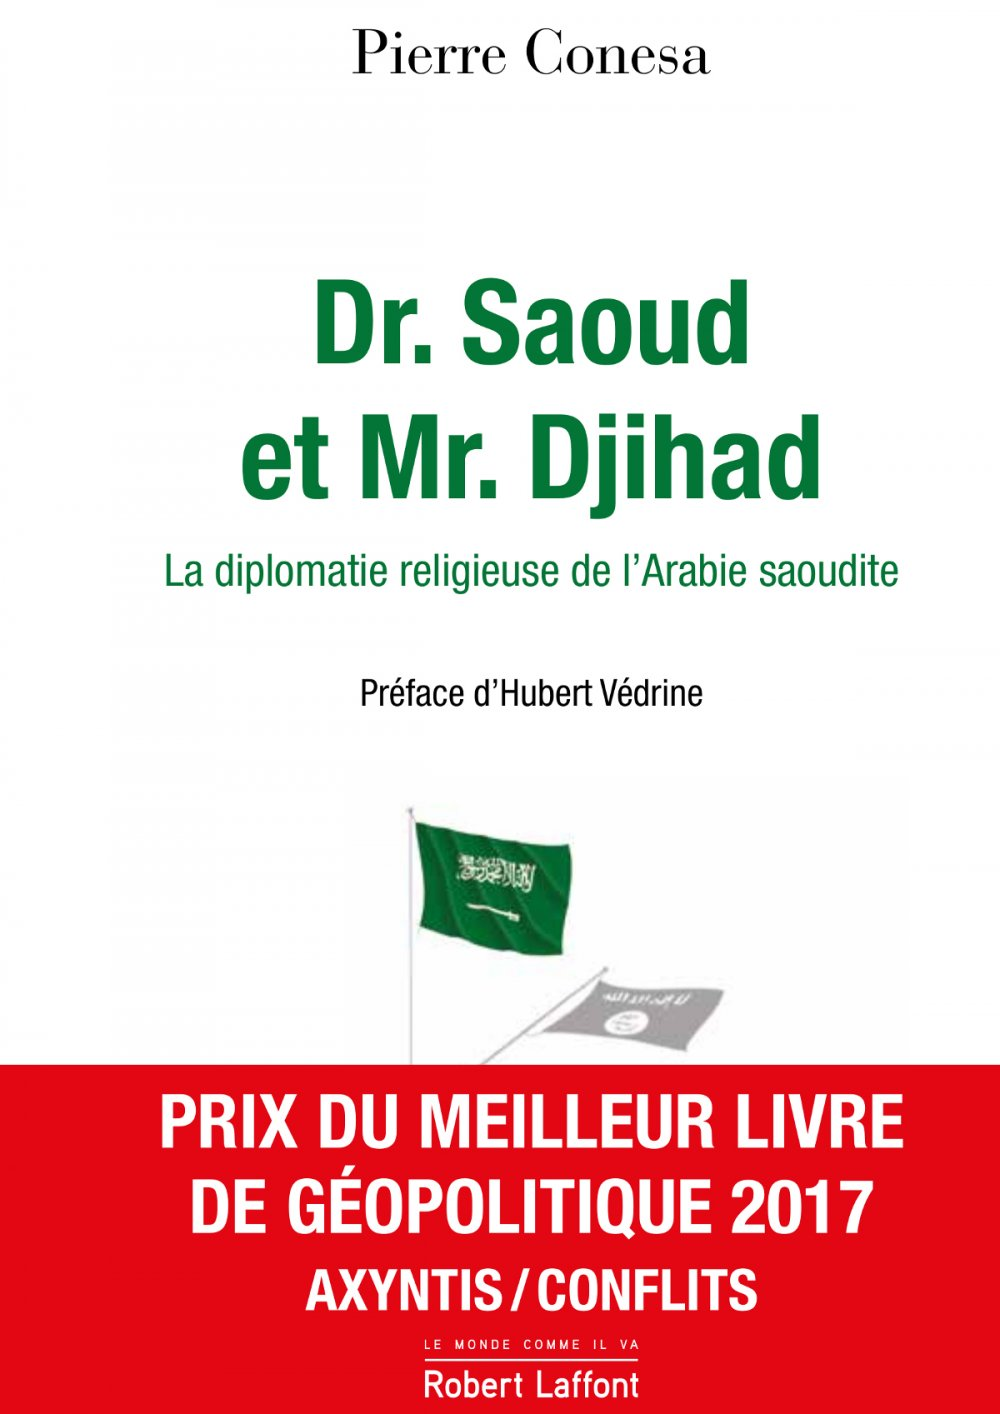 PIERRE CONESA, DR. SAOUD ET MR. DJIHAD : LA DIPLOMATIE RELIGIEUSE DE L'ARABIE SAOUDITE